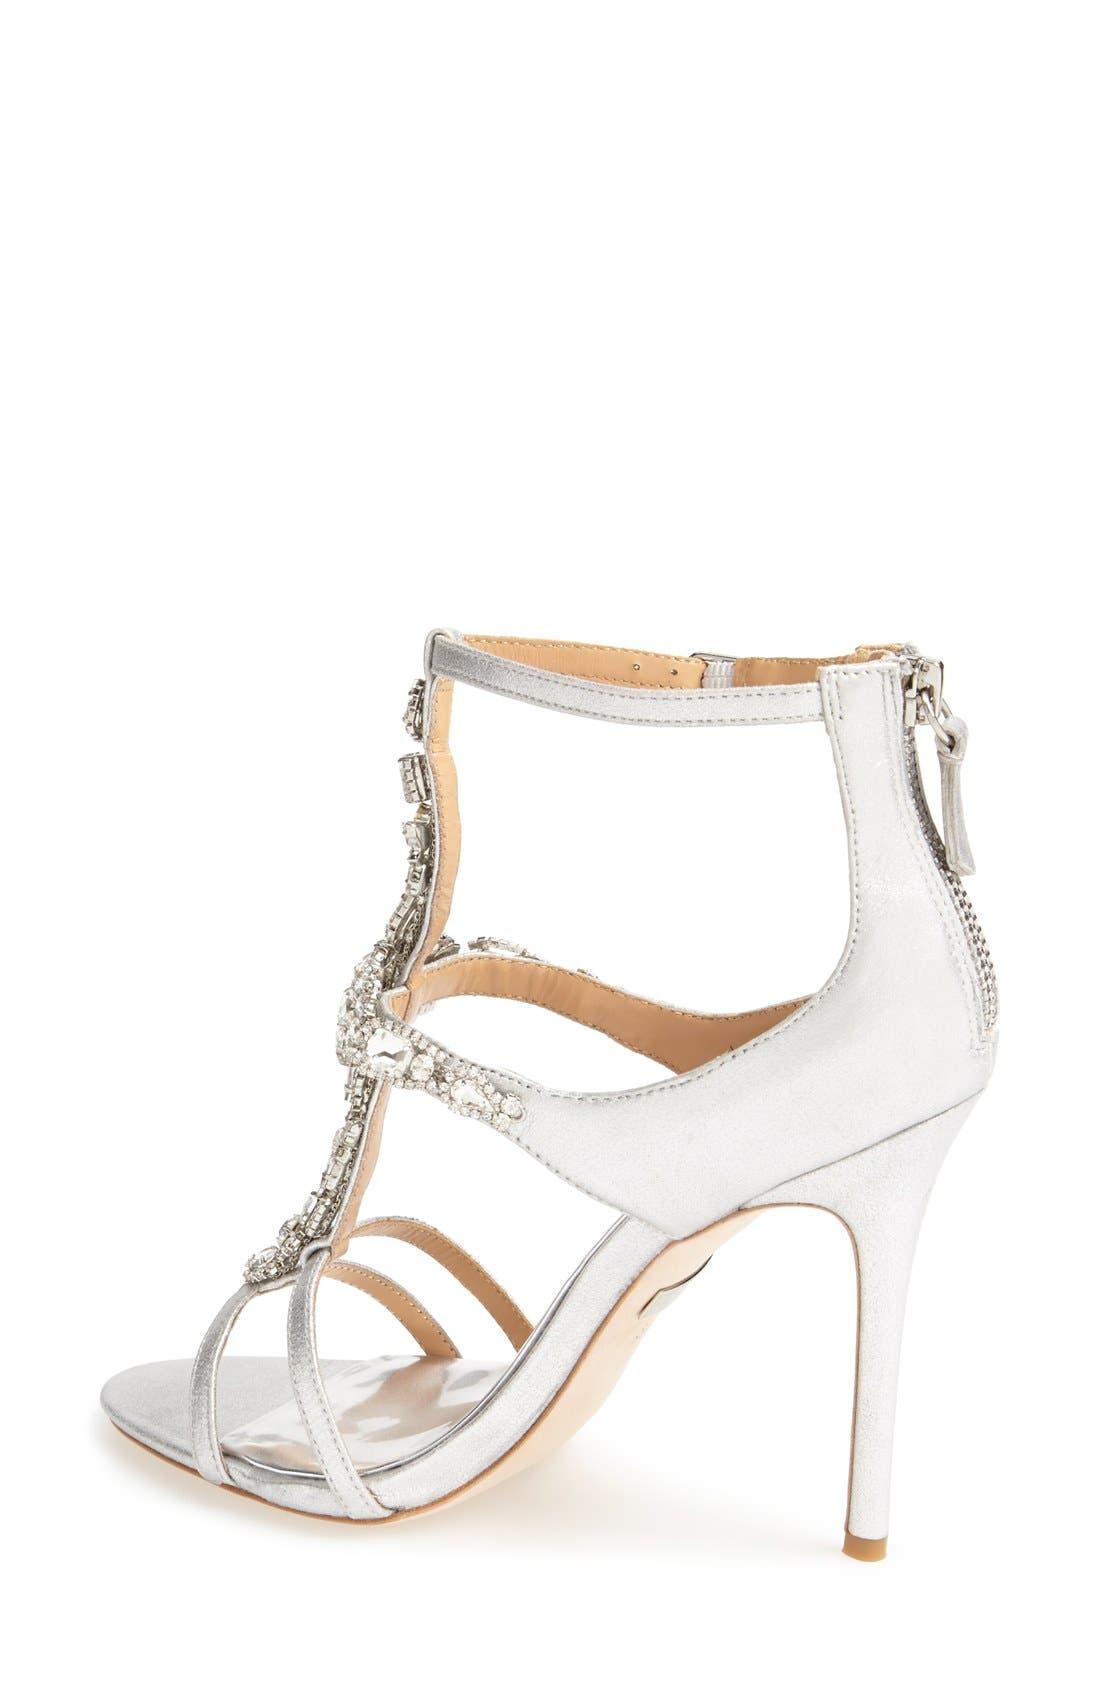 Alternate Image 3  - Badgley Mischka 'Giovanna II' Satin Ankle Strap Sandal (Women)